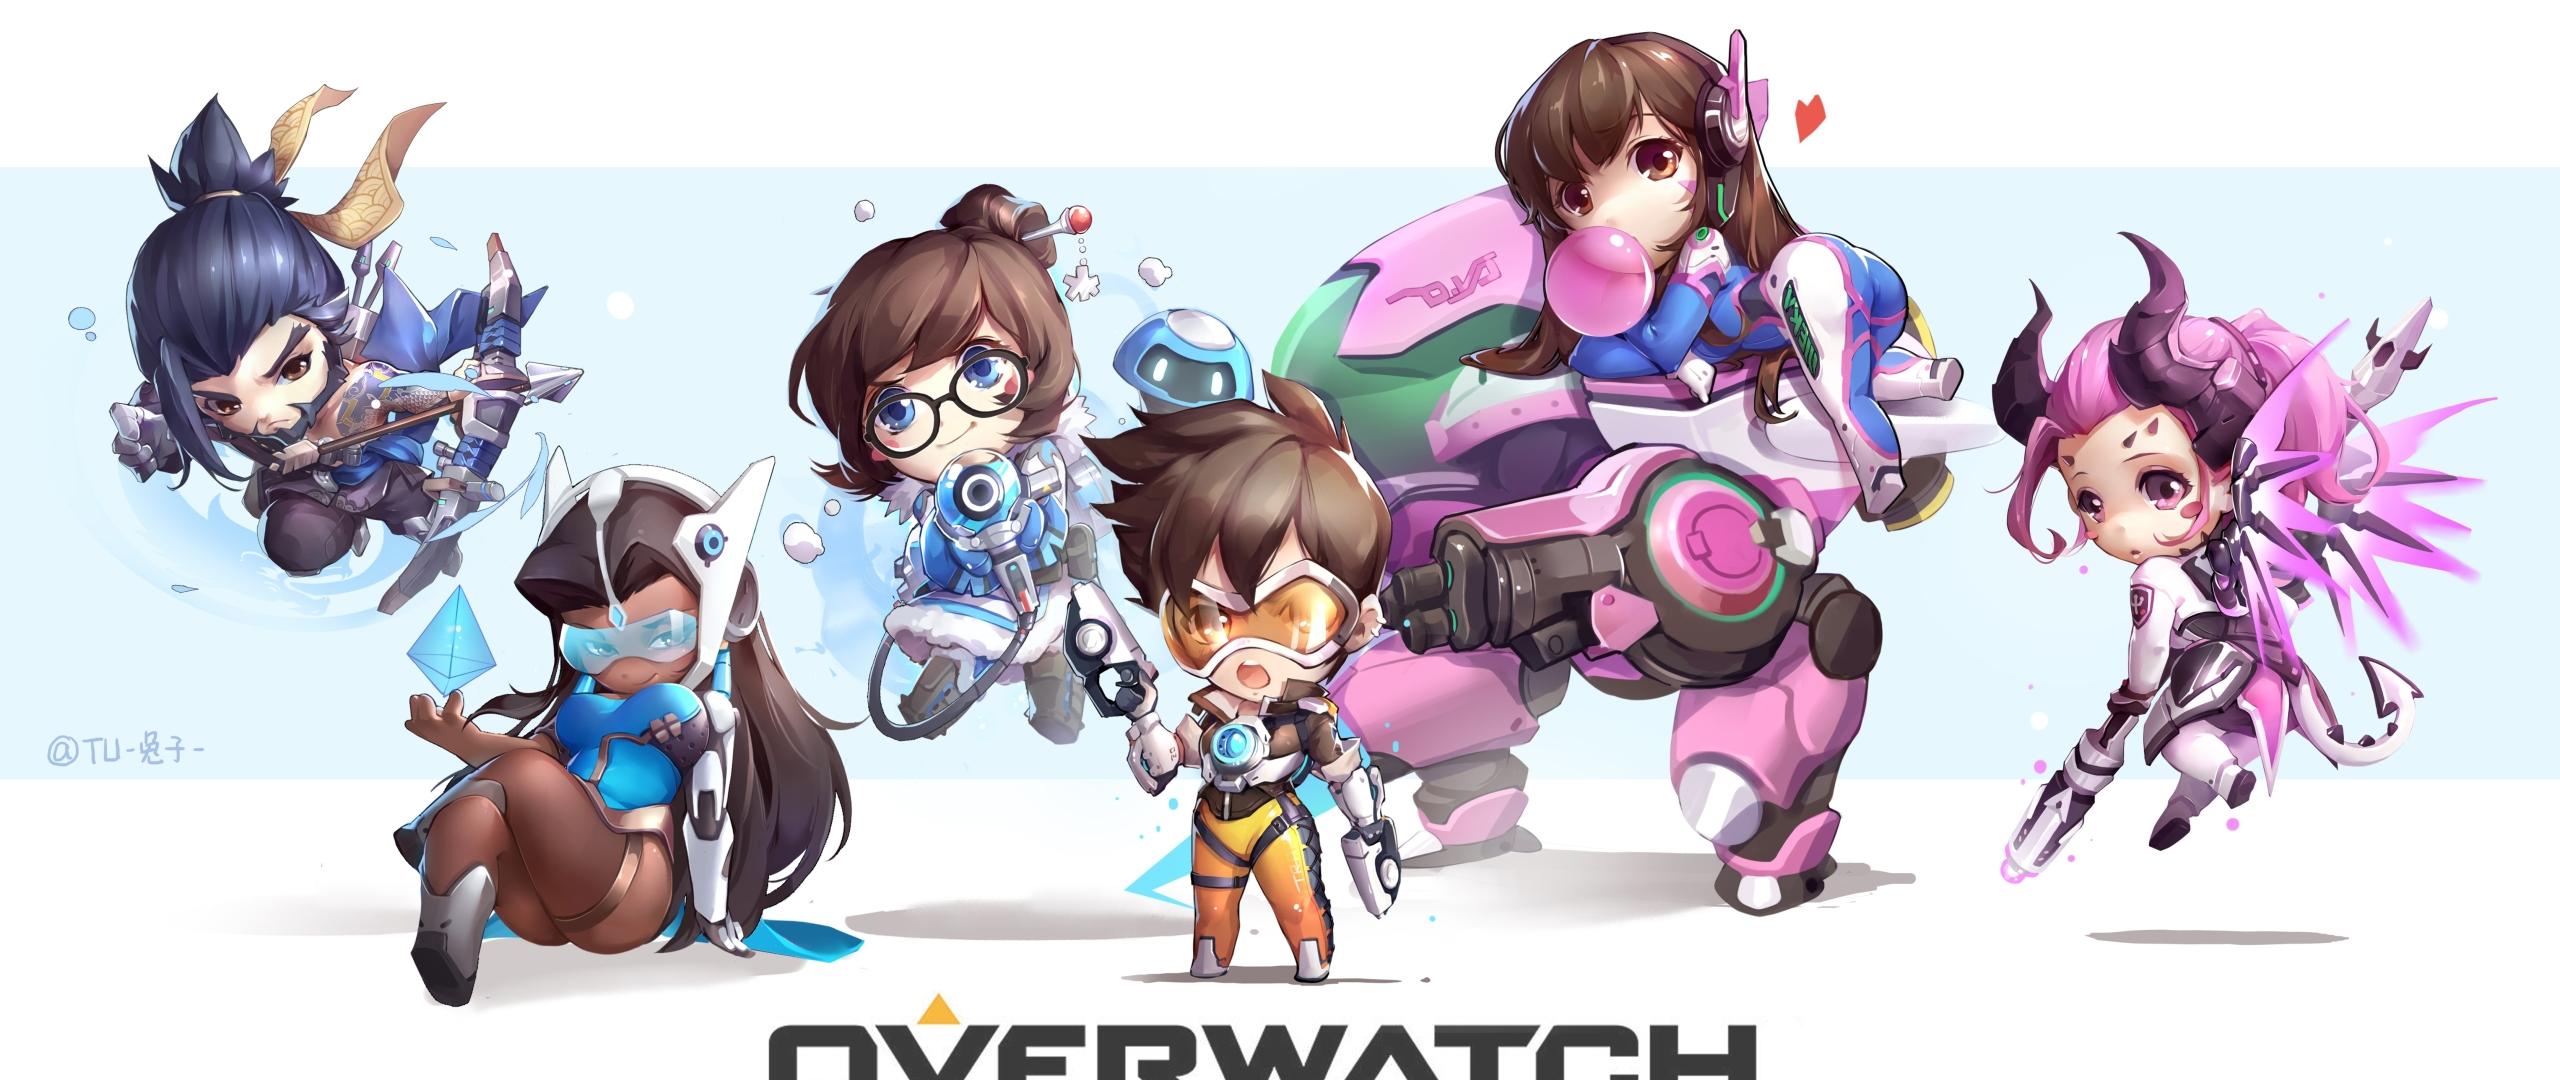 overwatch game artwork  hd 8k wallpaper